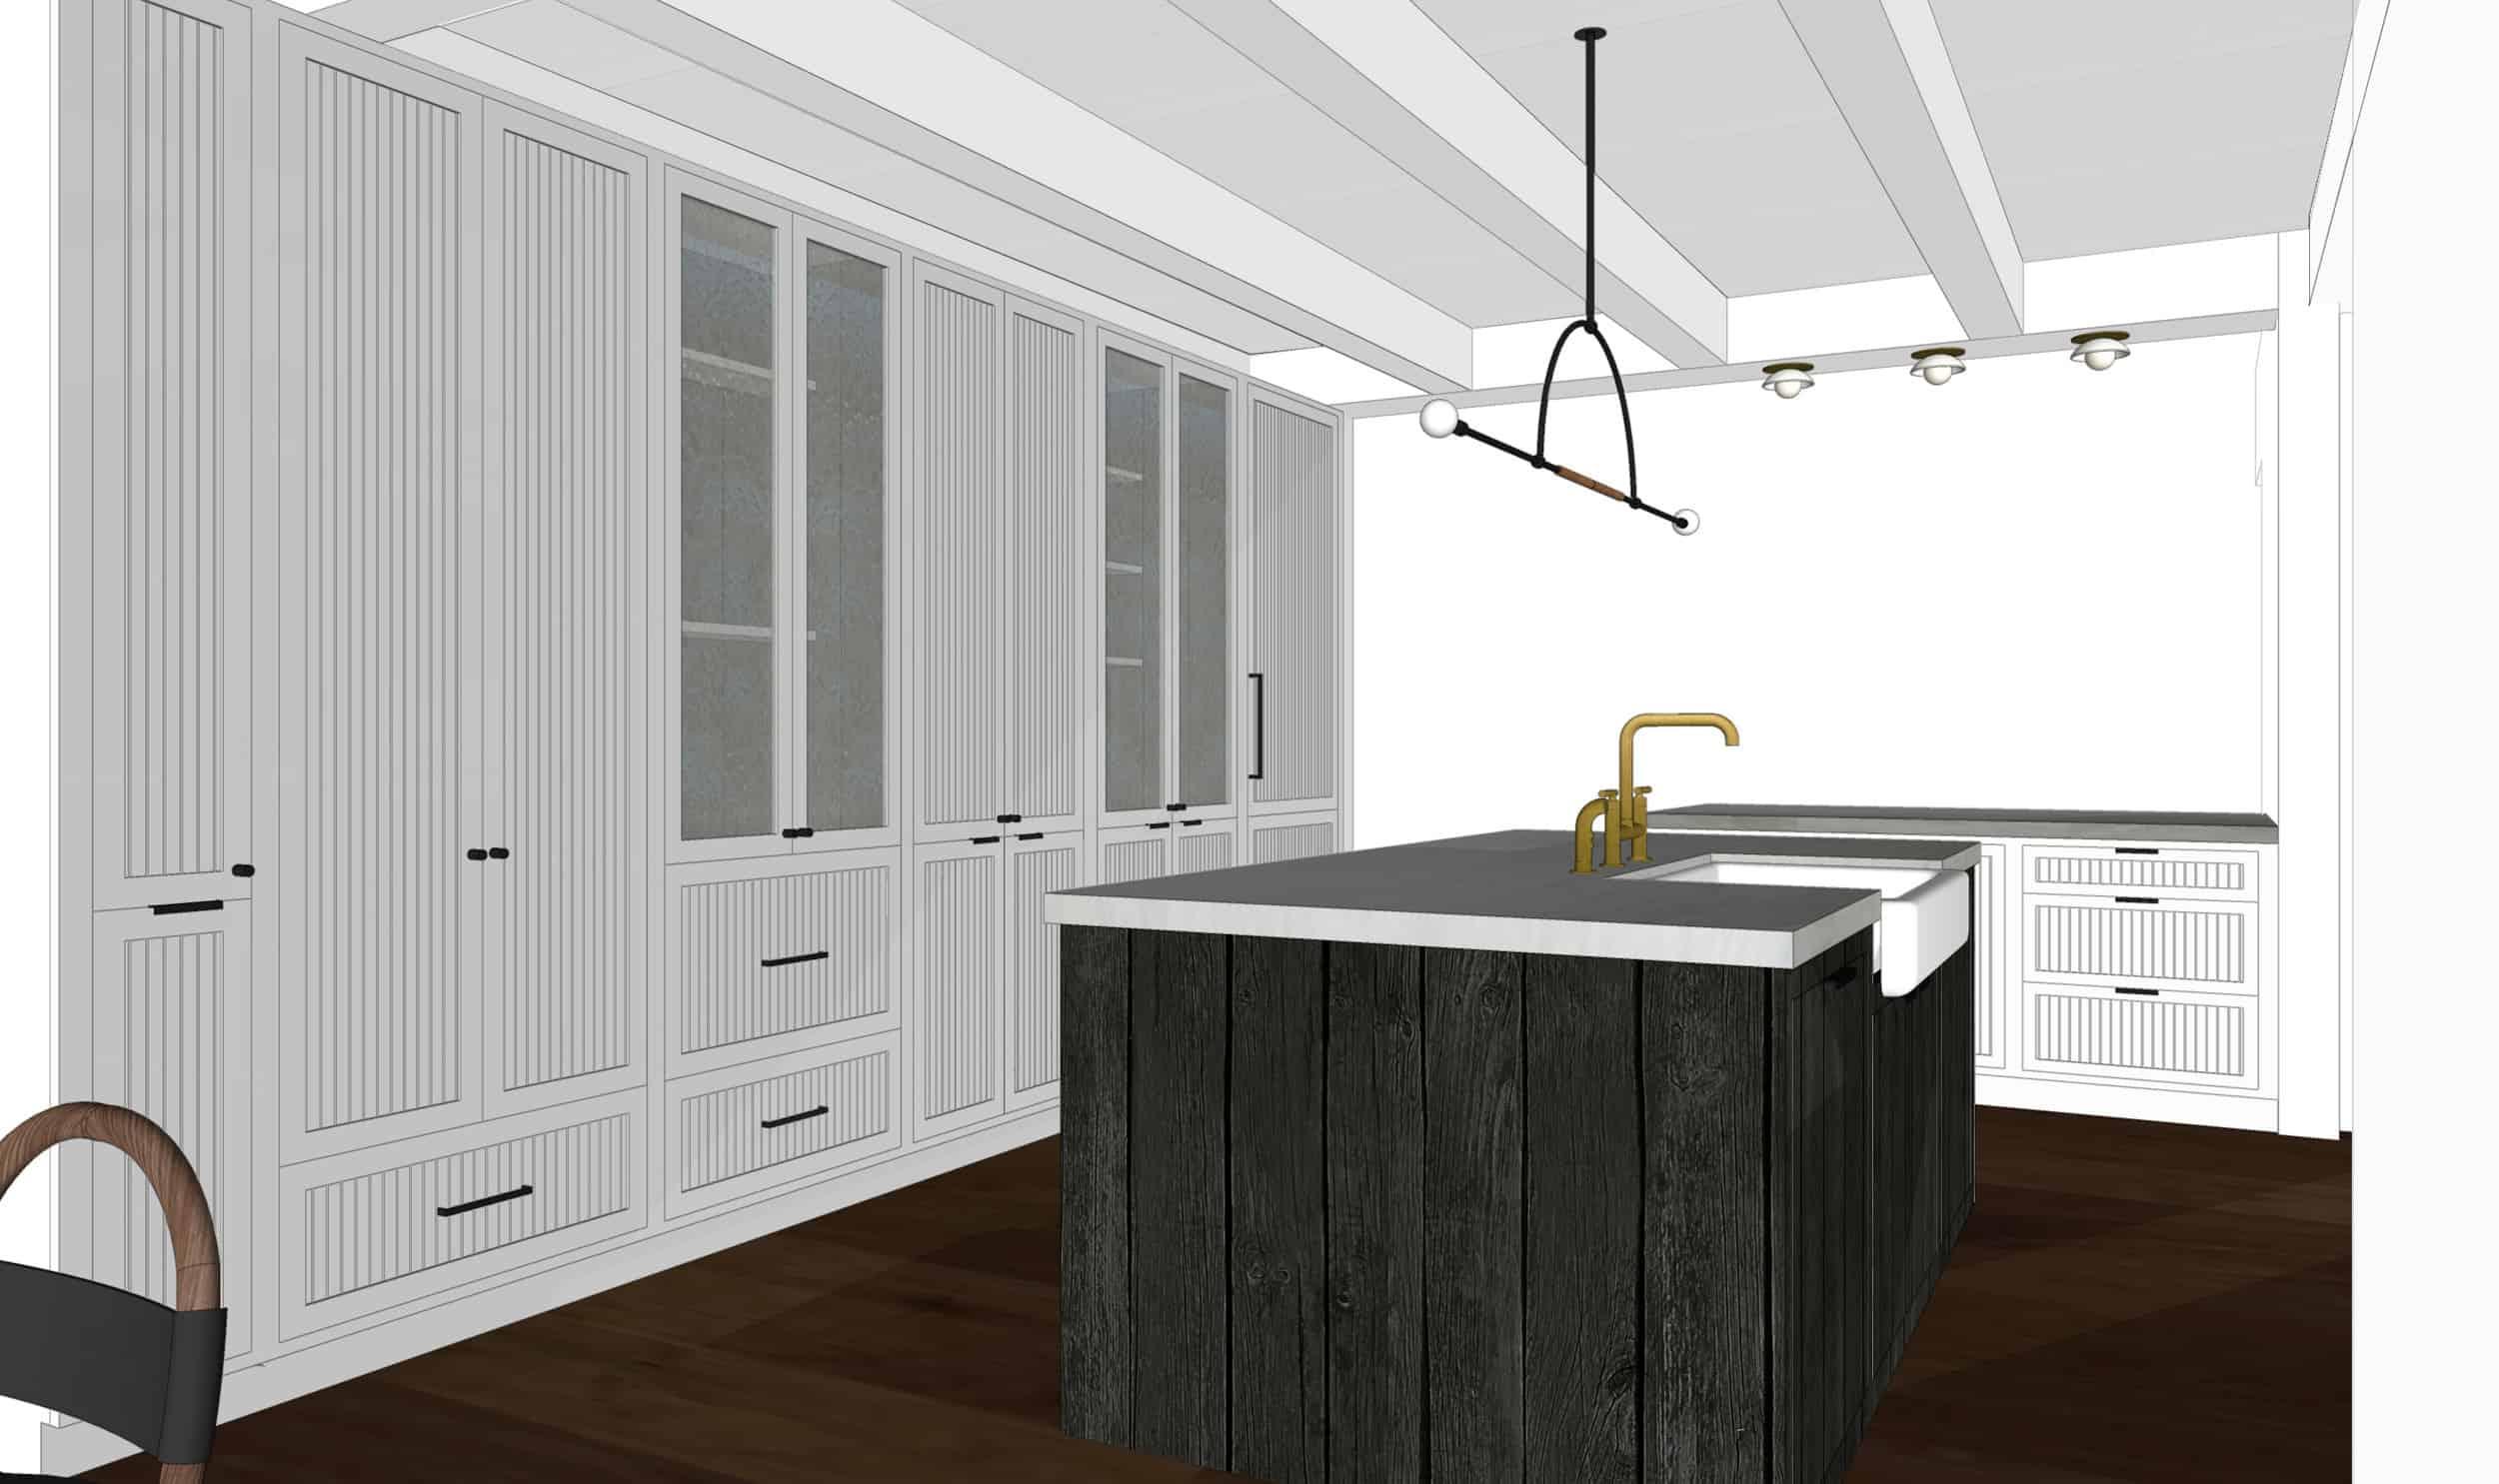 Emily Henderson Mountain Fixer Upper I Design You Decide Kitchen Render 05 Fnladj